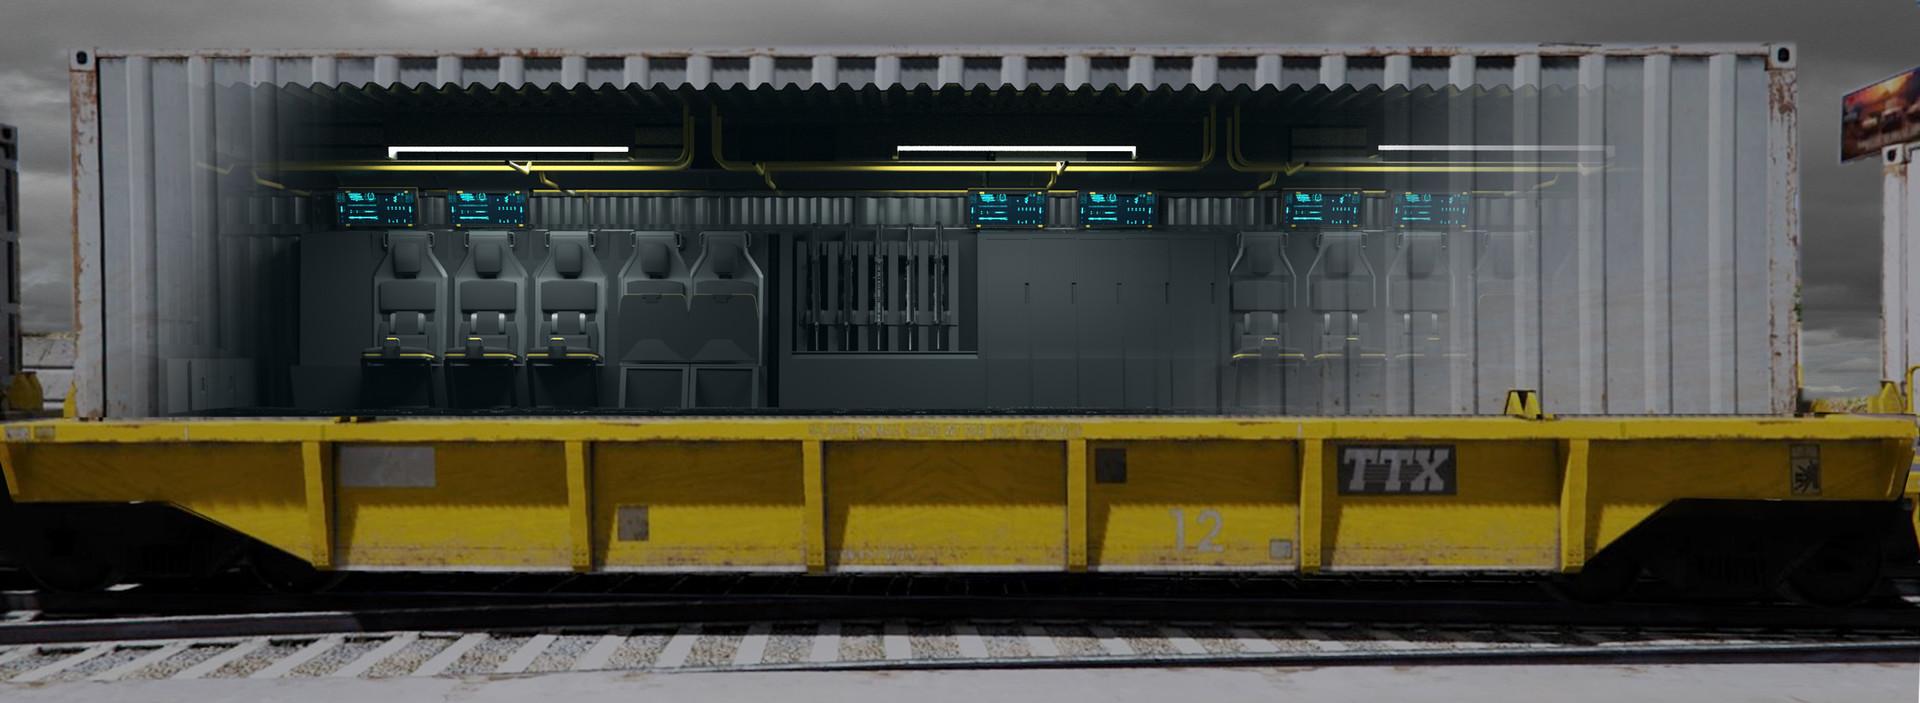 Matt kohr matt kohr traincontainer trooptransport side